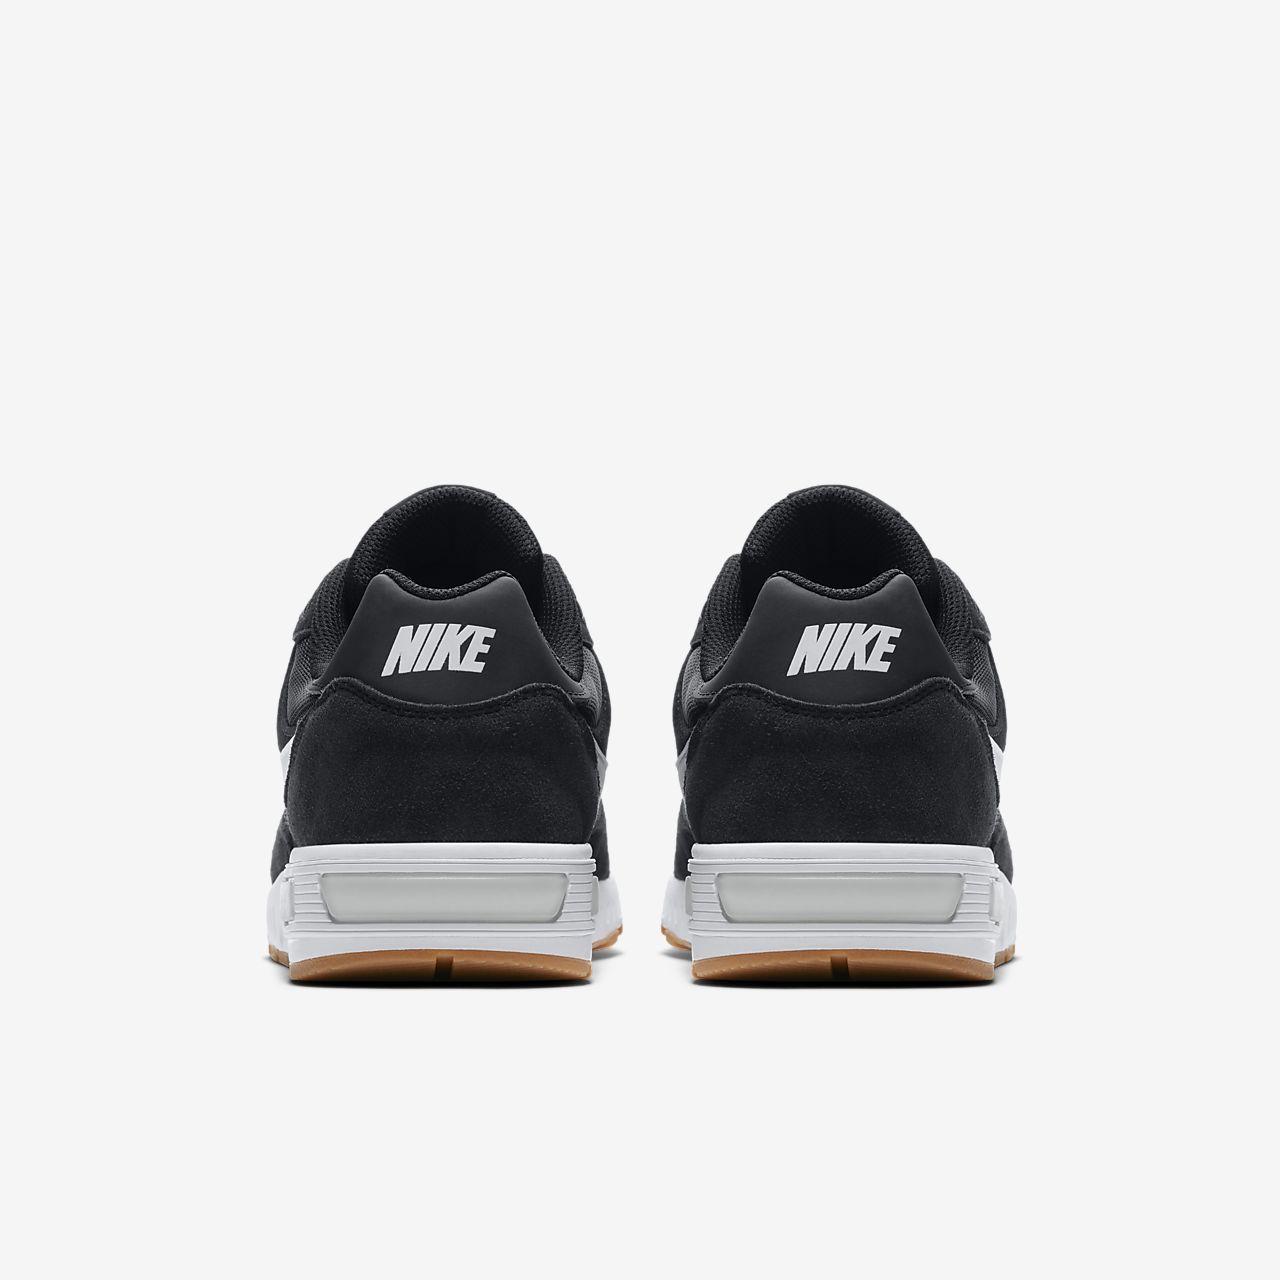 buy online 3f0b2 9ab78 Low Resolution Nike Nightgazer schoen voor heren Nike Nightgazer schoen  voor heren